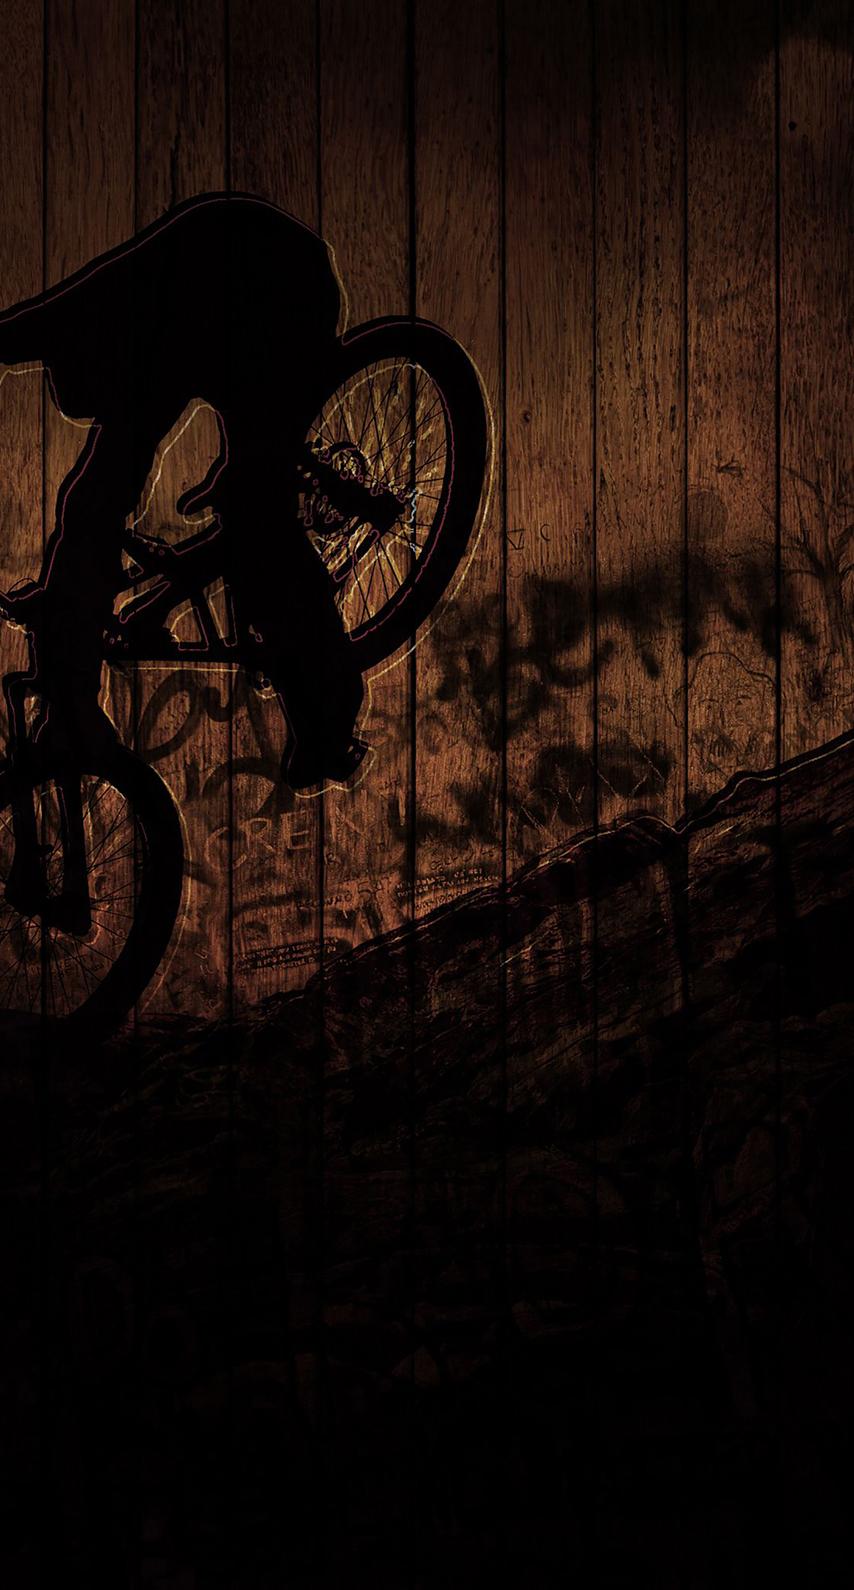 street light, bicycle motocross